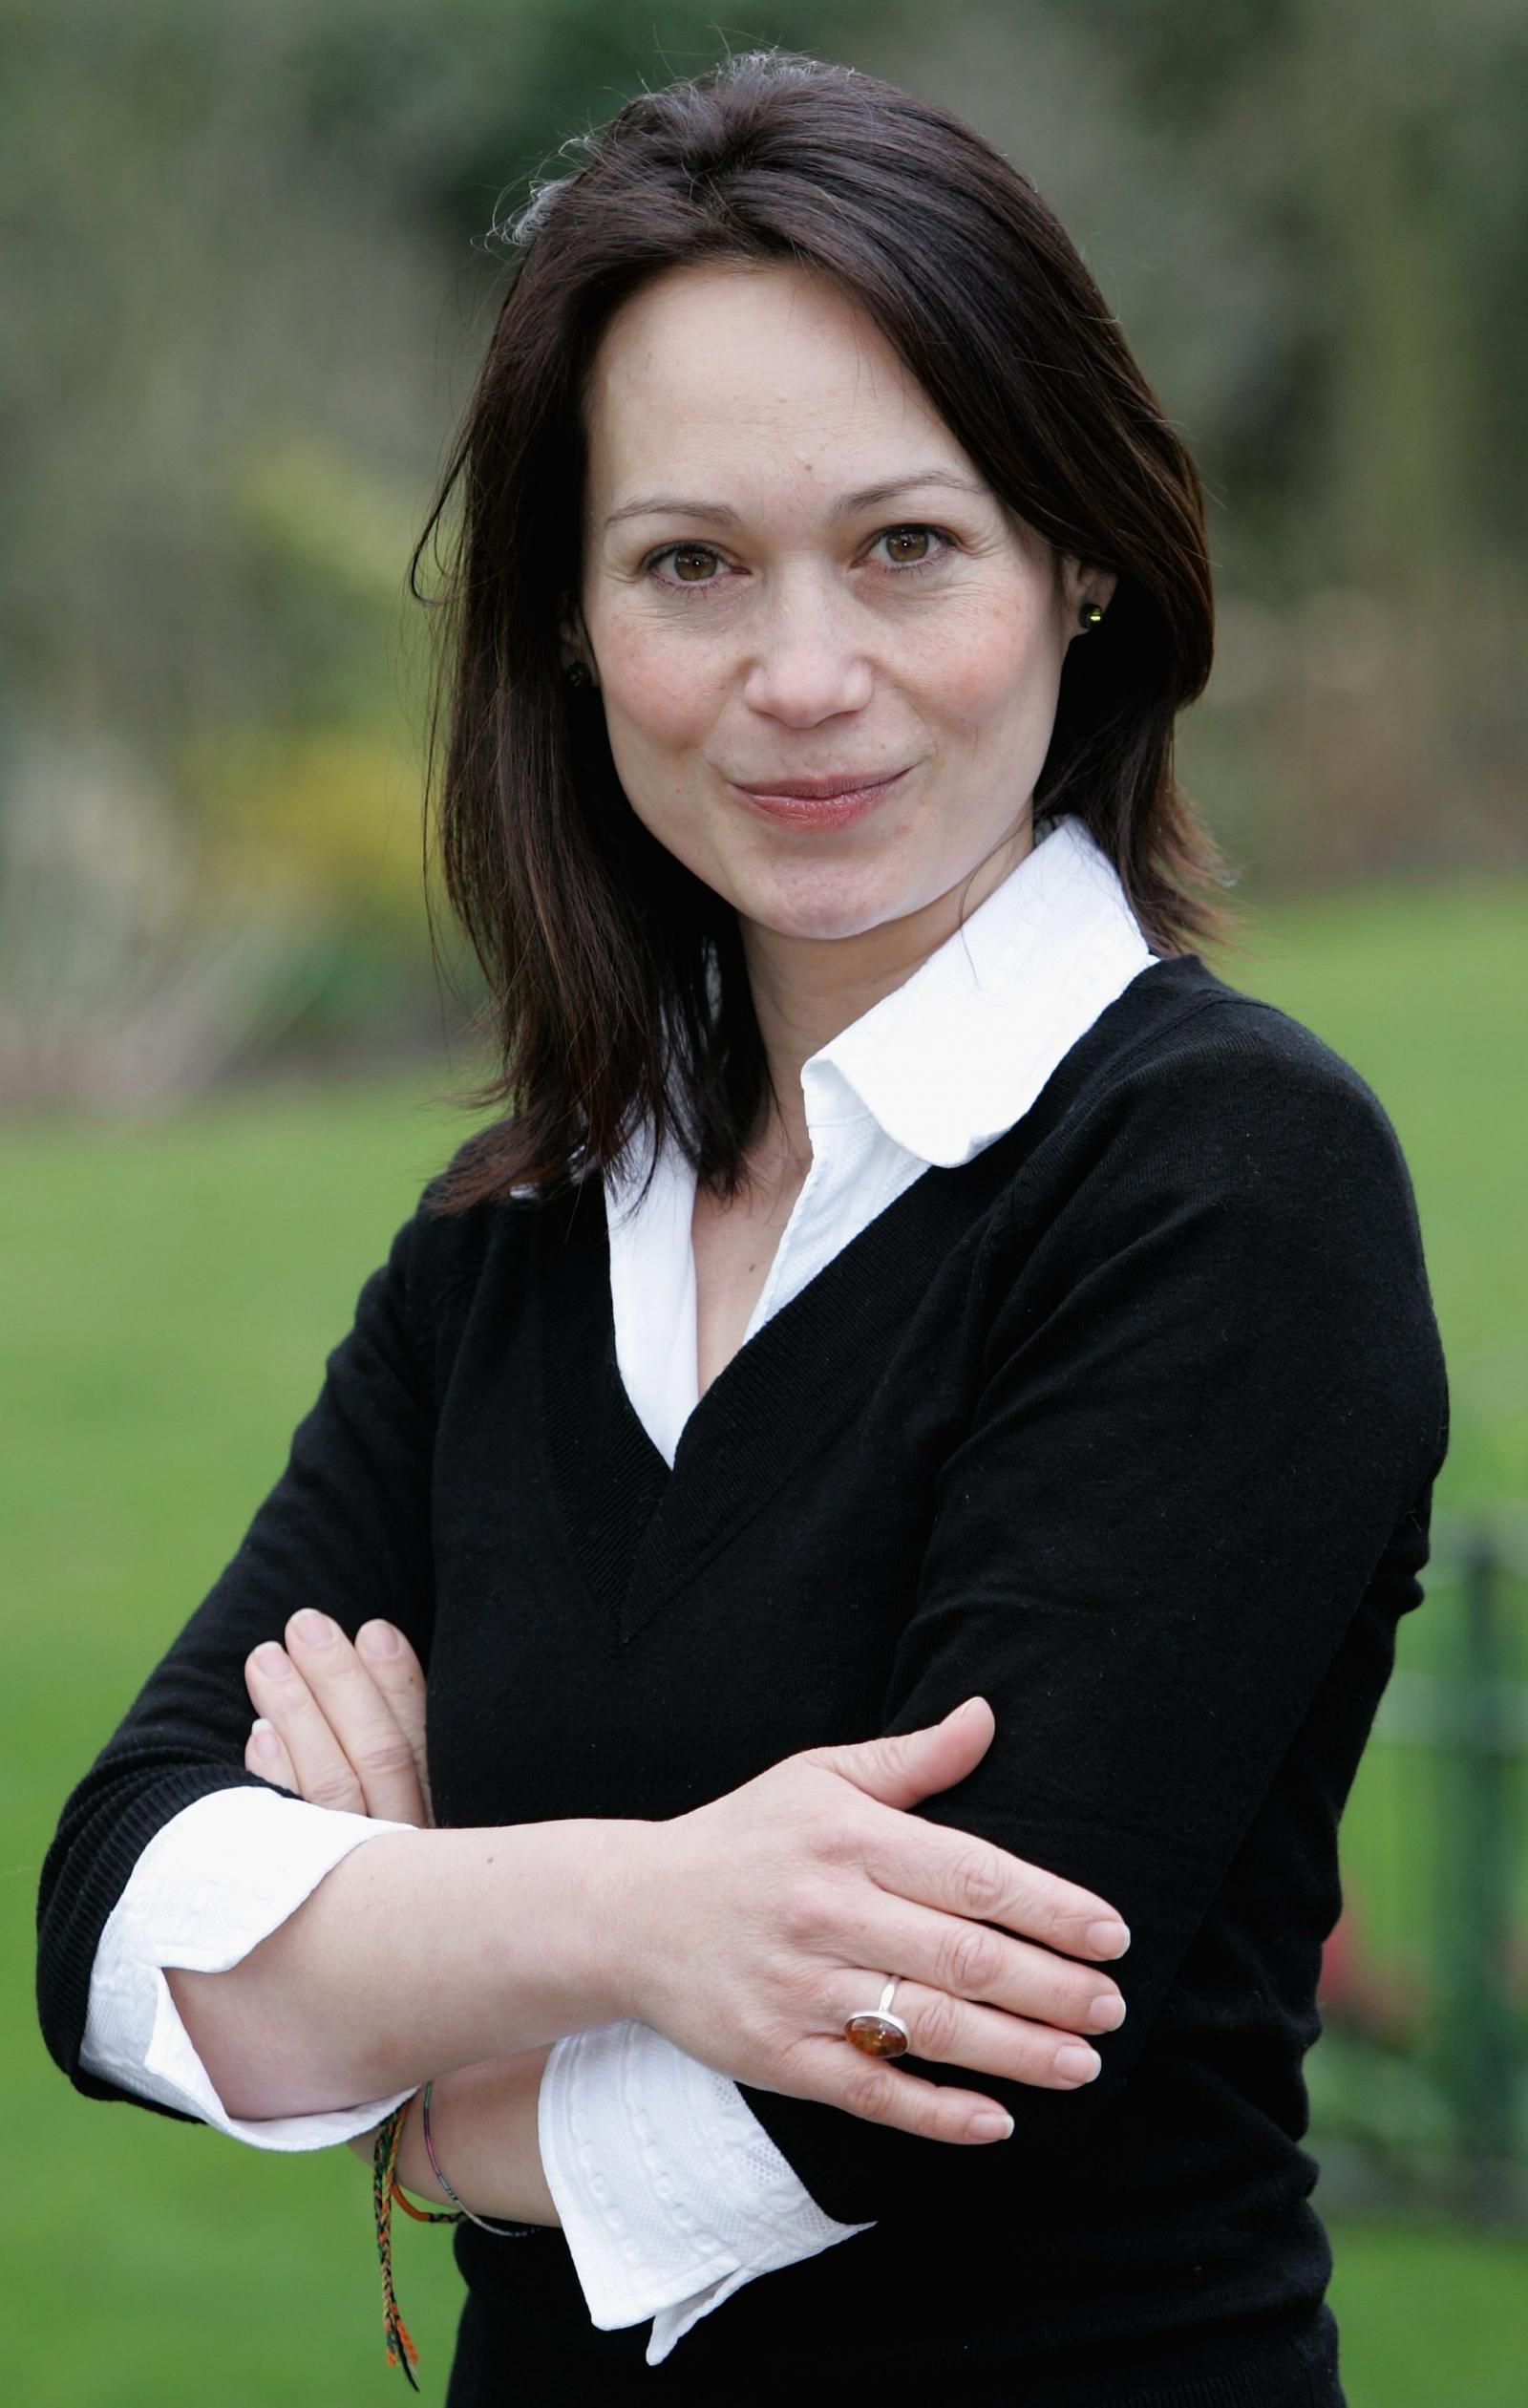 Leah Bracknell Emmerdale